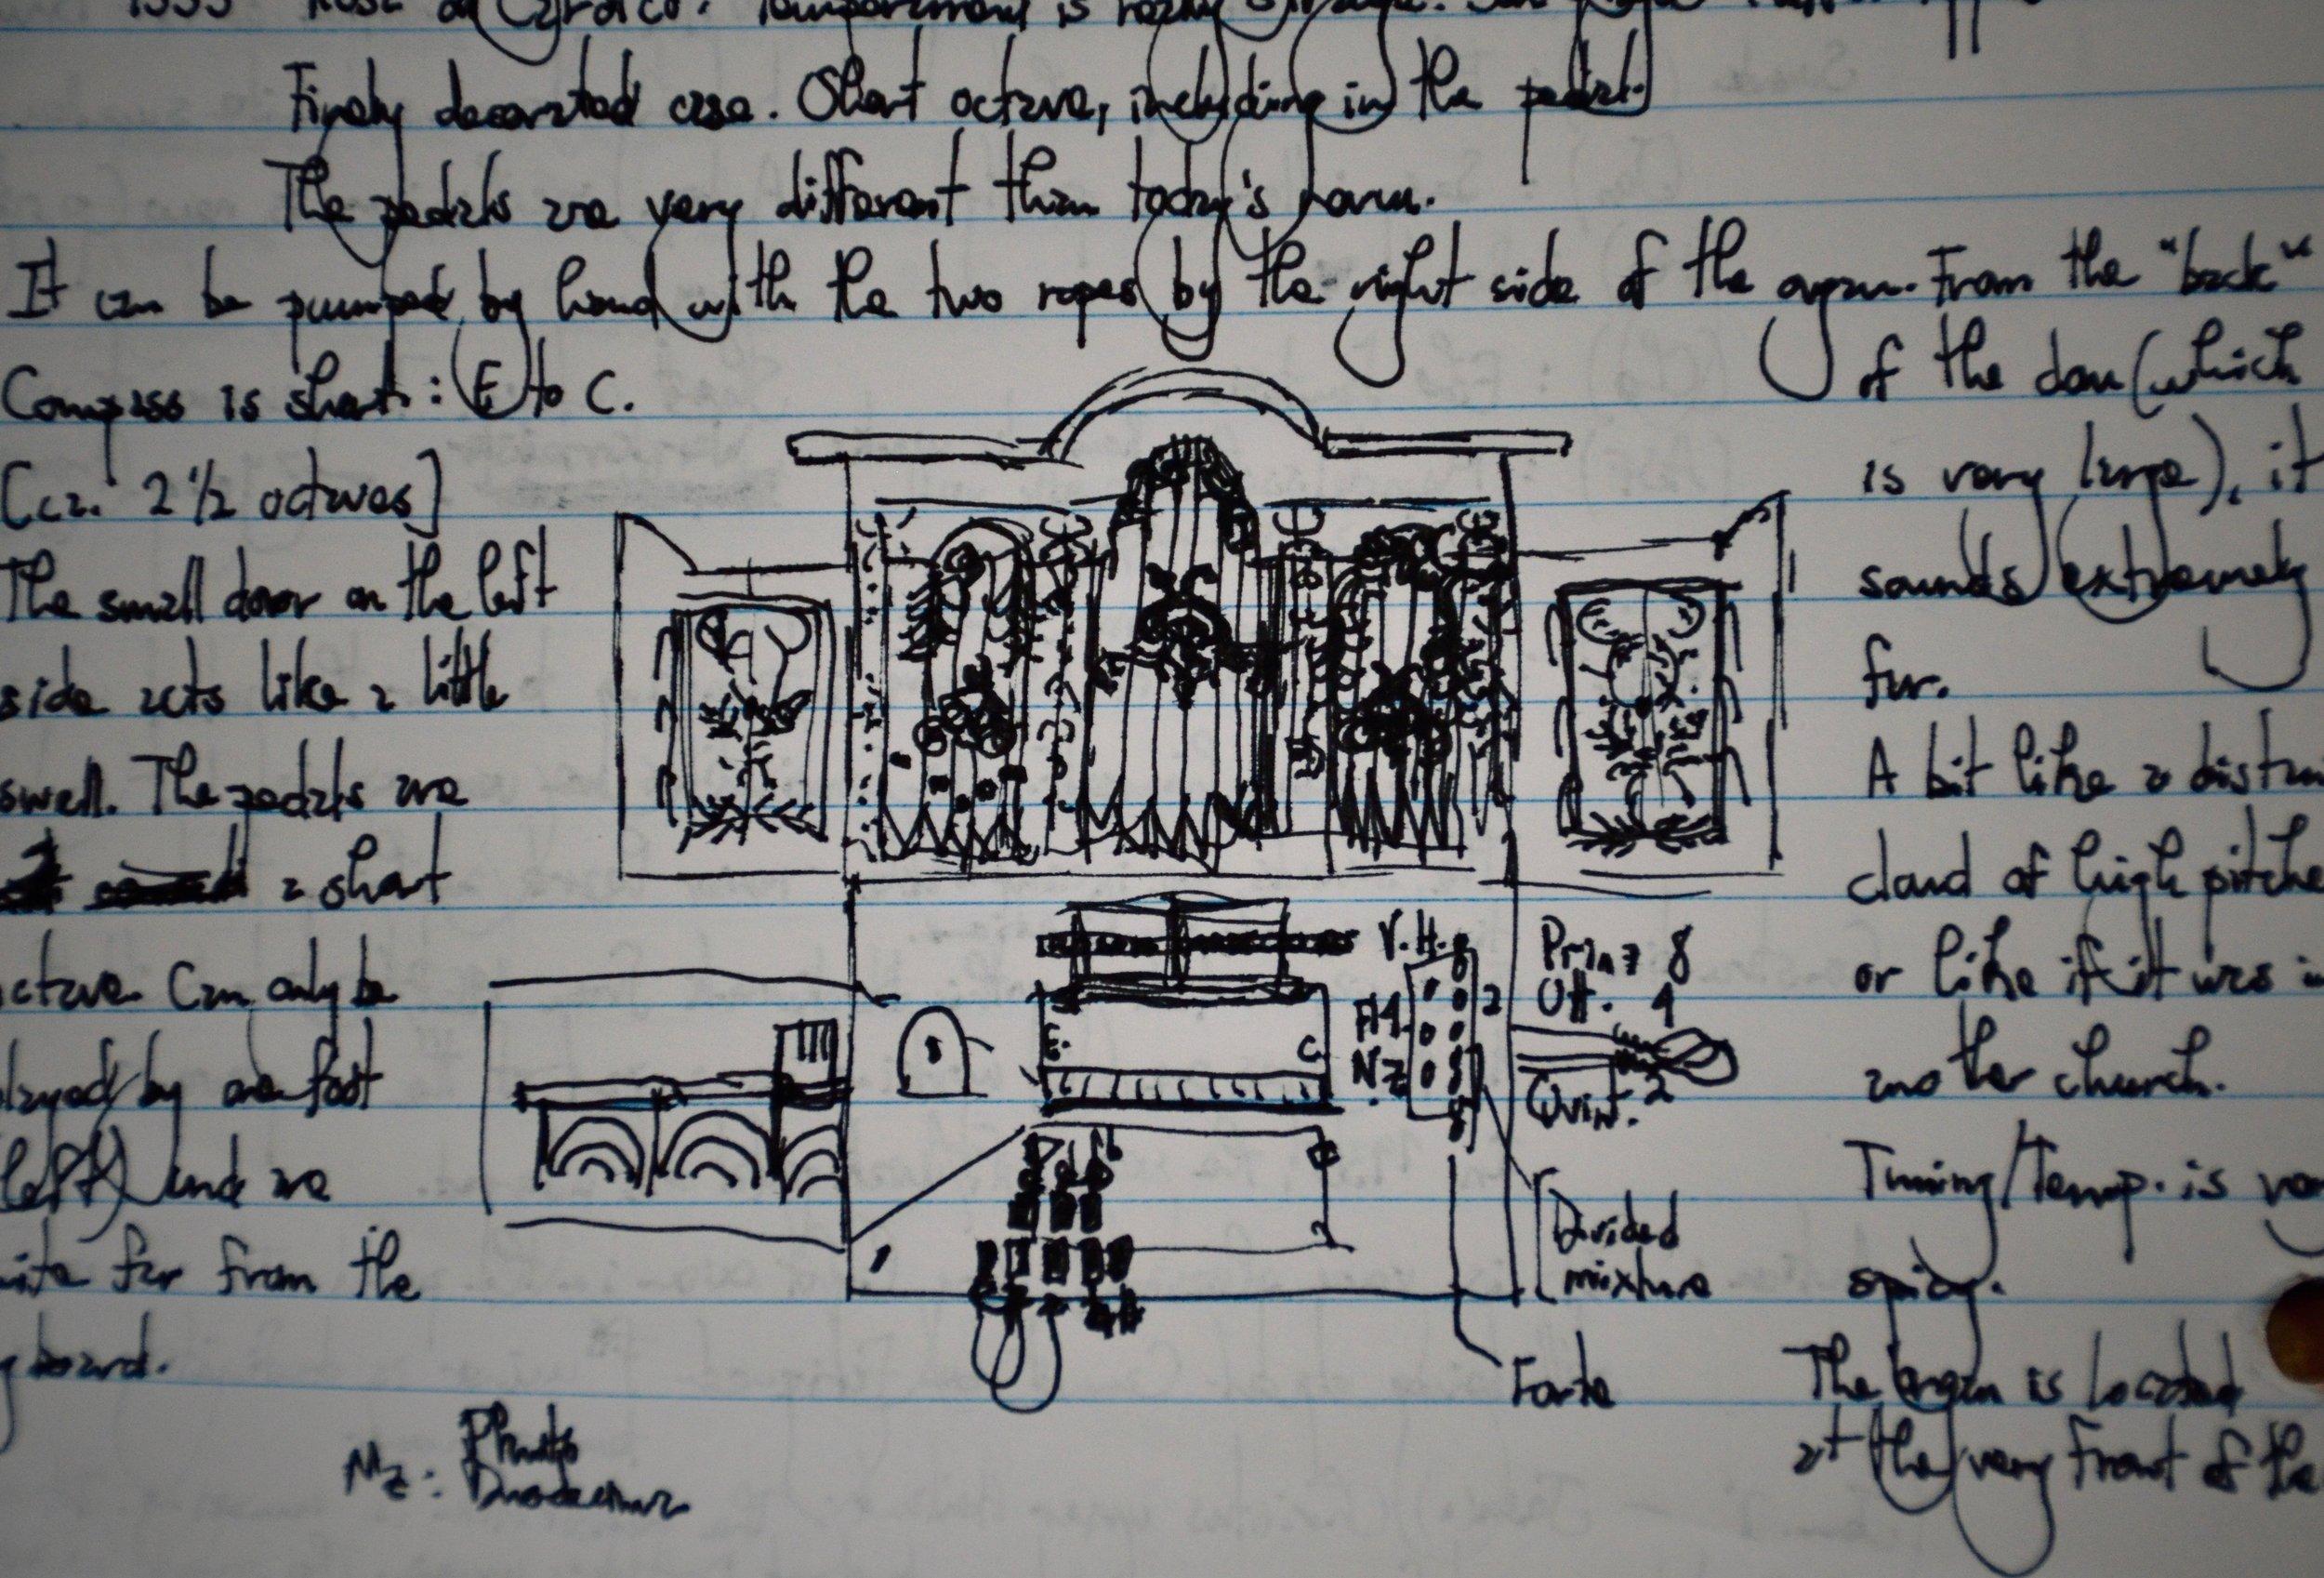 1777 Italian Baroque organ in Lübeck Dom, as sketched by Rosemarie Tougas.